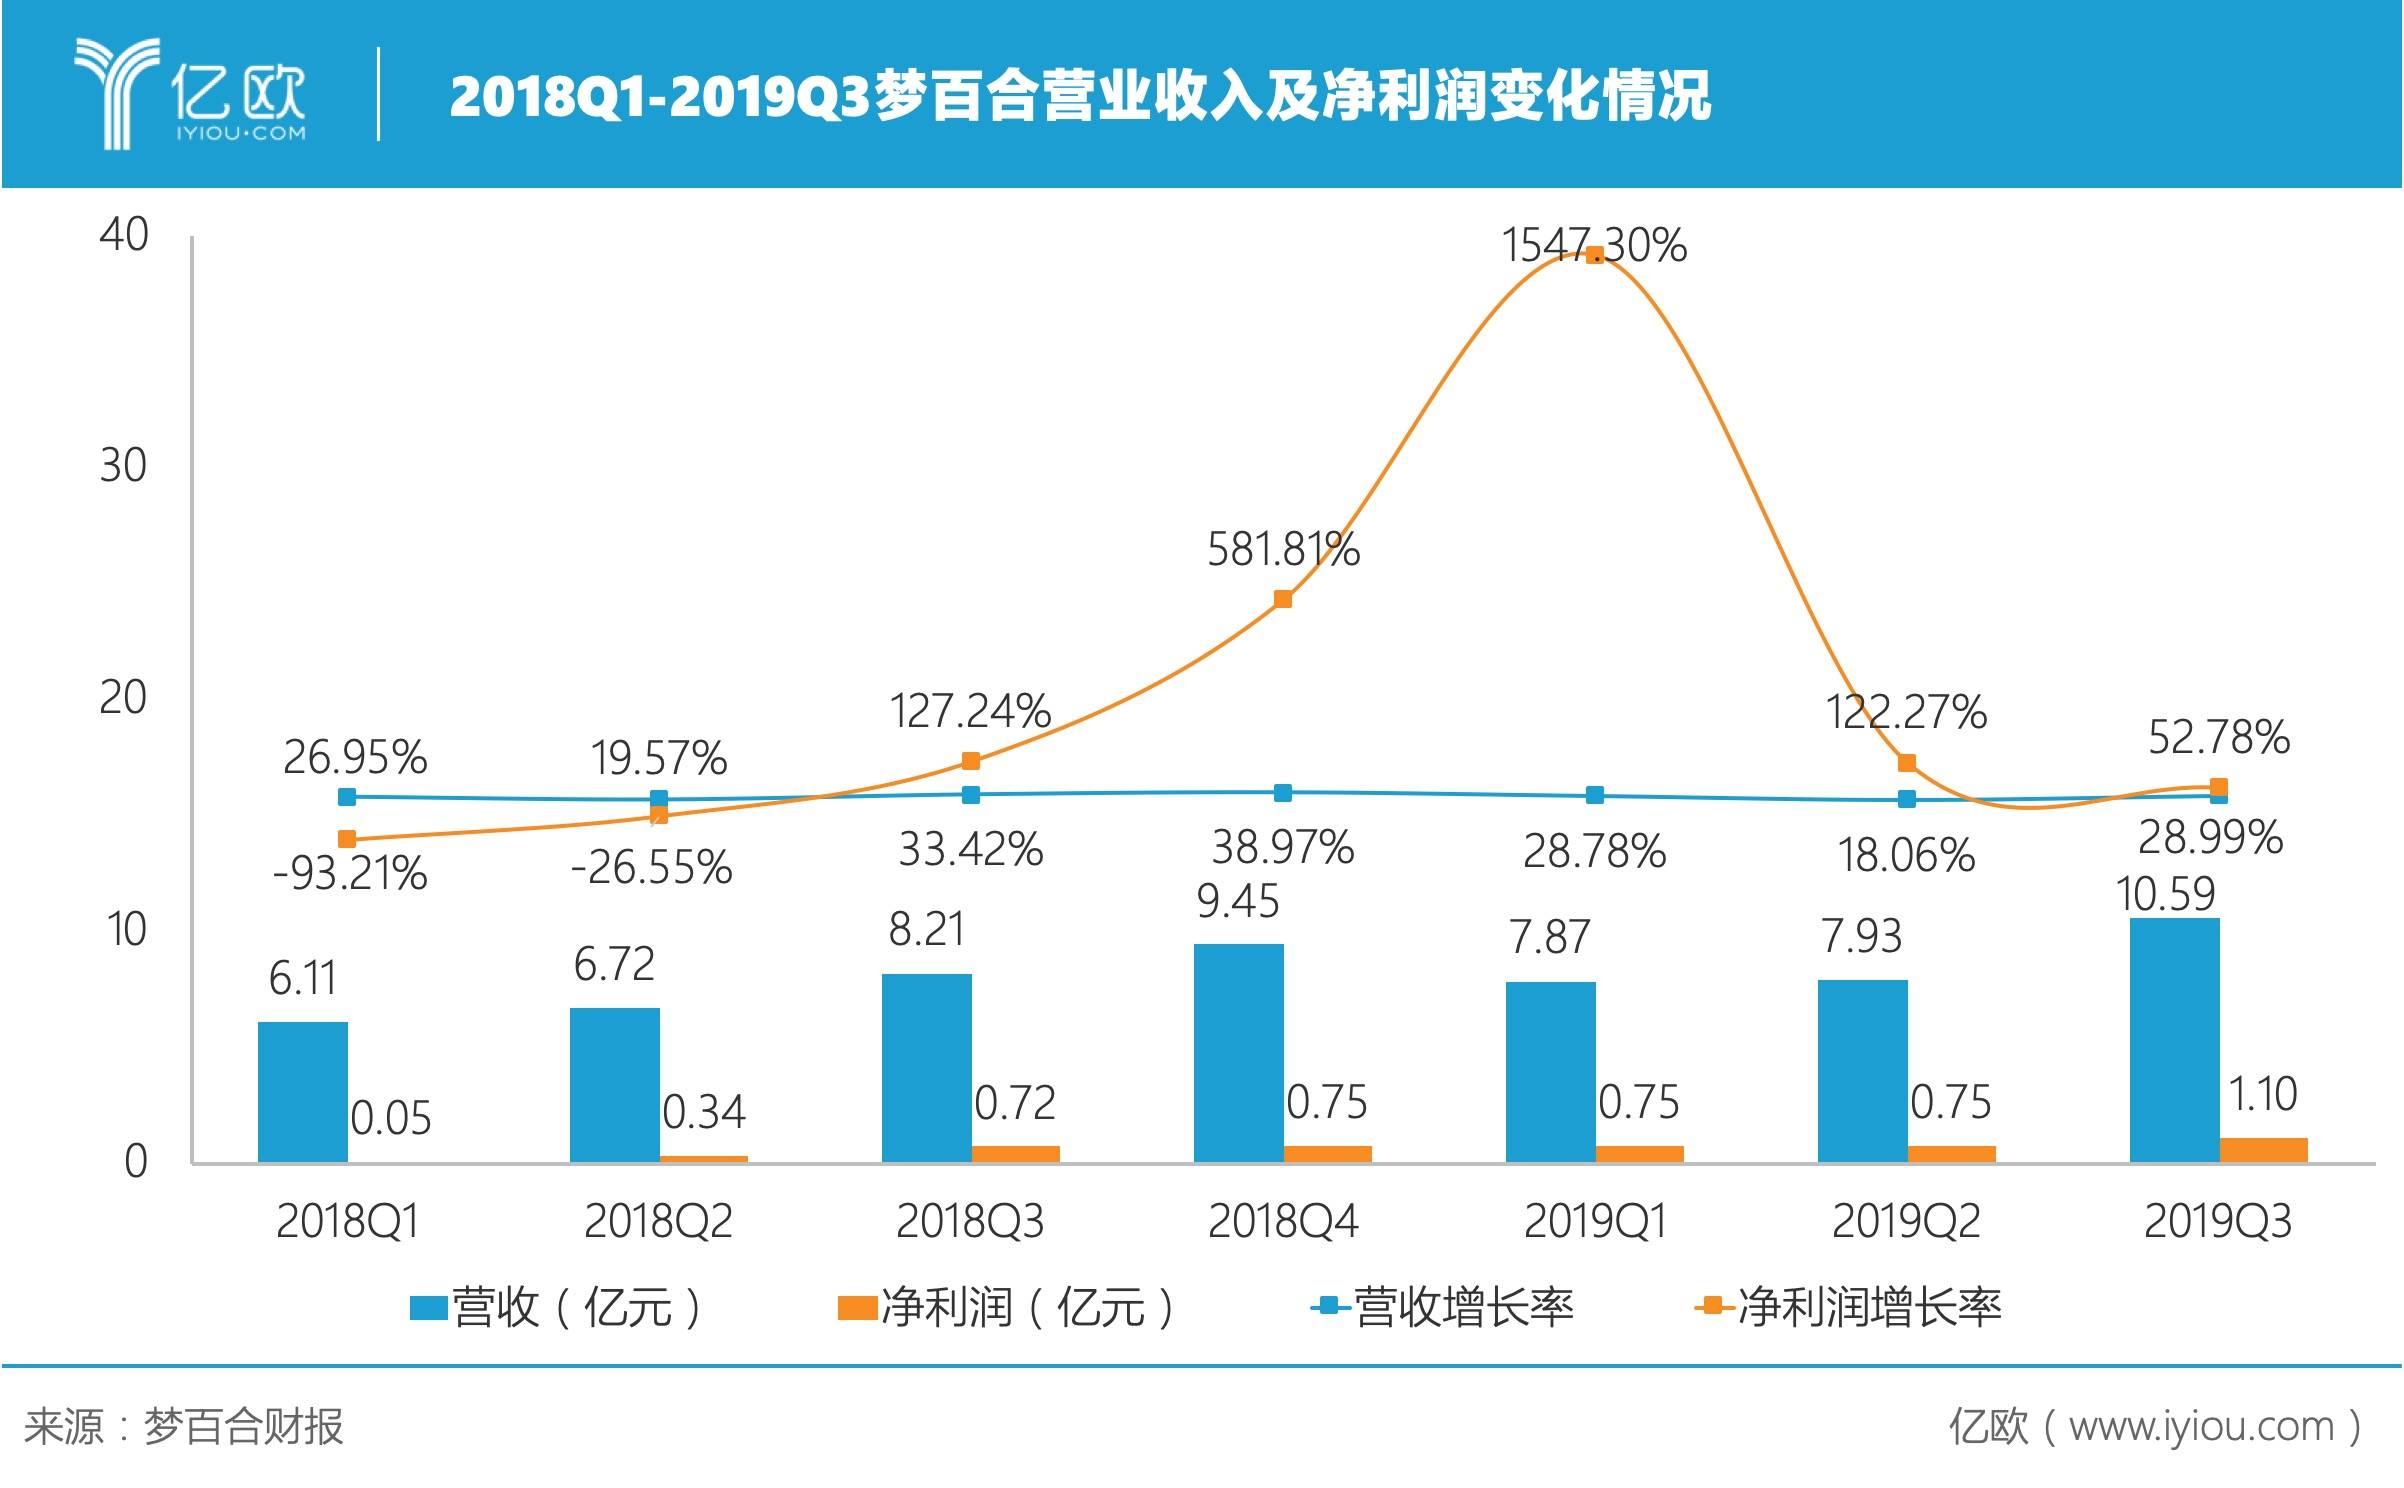 2018Q1-2019Q3梦百合营业收入及净利润变化情况